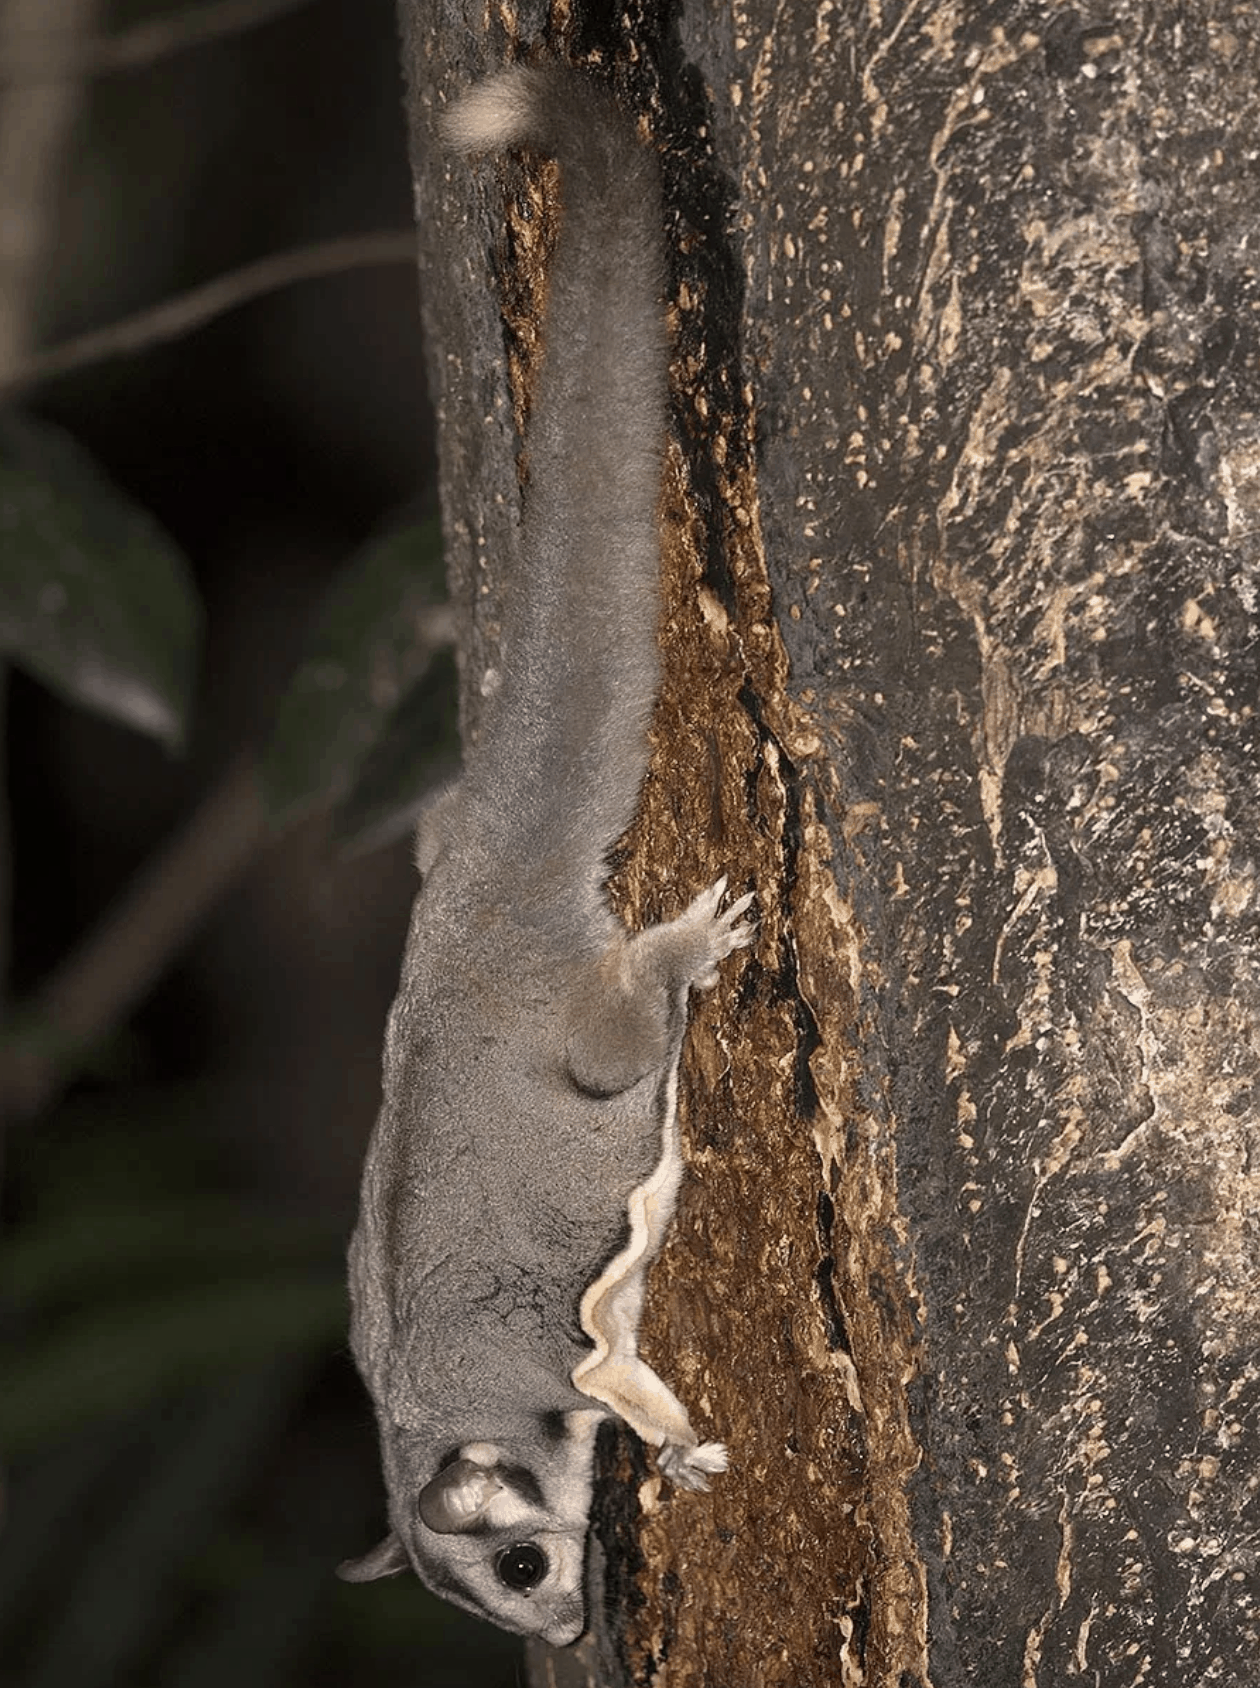 Sugar-Glider-Chambers-Wildlife-Lodge-Atherton-Tablelands-Queensland-Australia-photo by // GoBirding.com